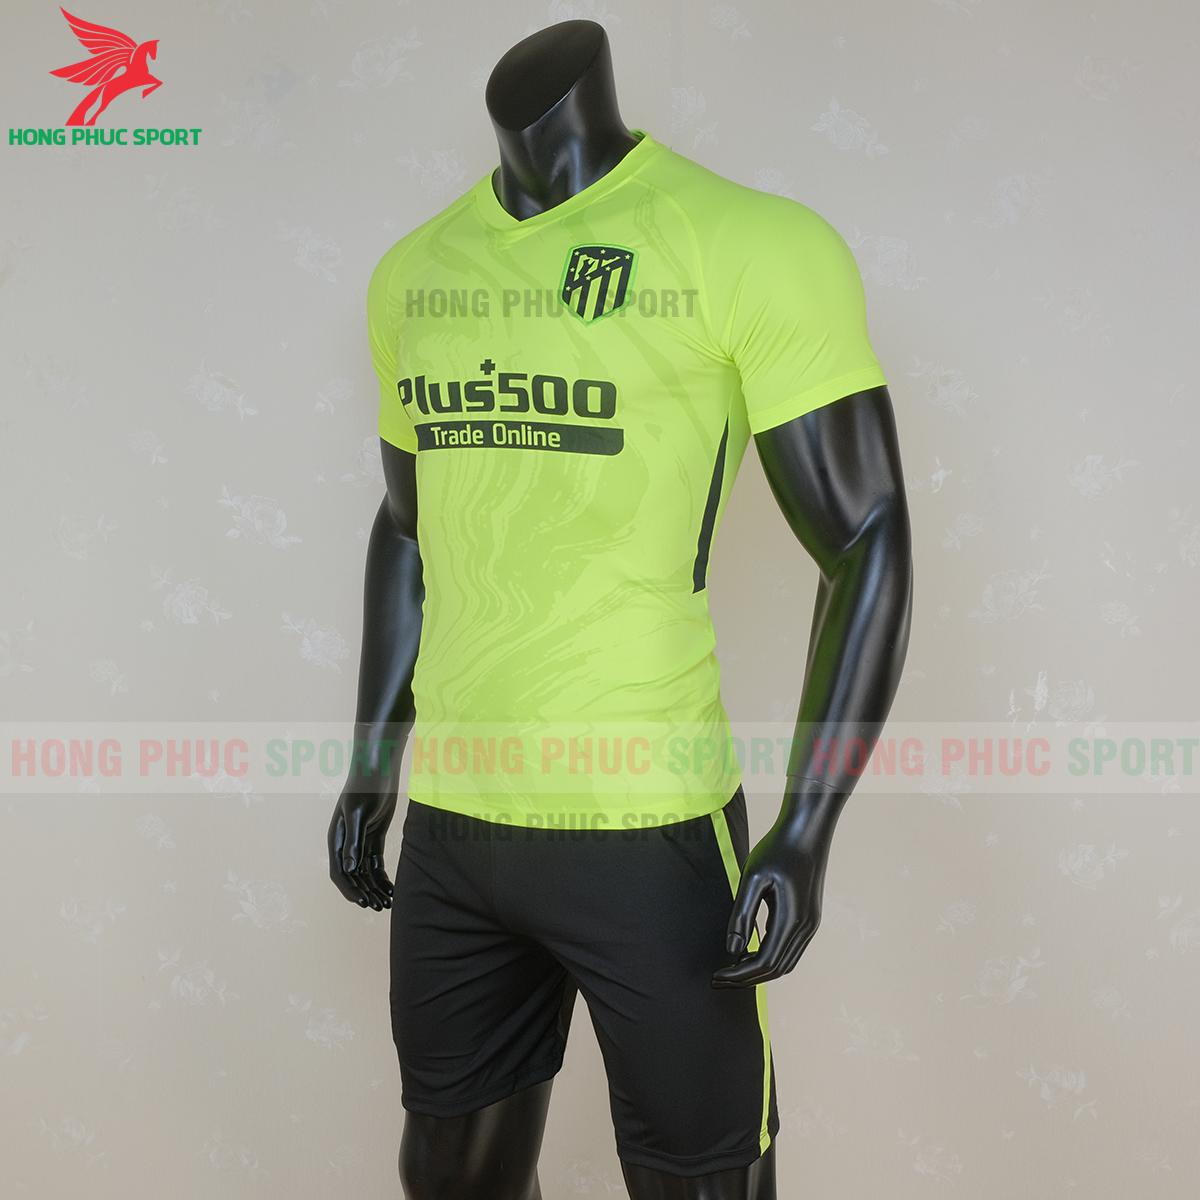 https://cdn.hongphucsport.com/unsafe/s4.shopbay.vn/files/285/ao-atletico-madrid-2020-2021-mau-thu-3-4-5f6d4aa42cdfd.png